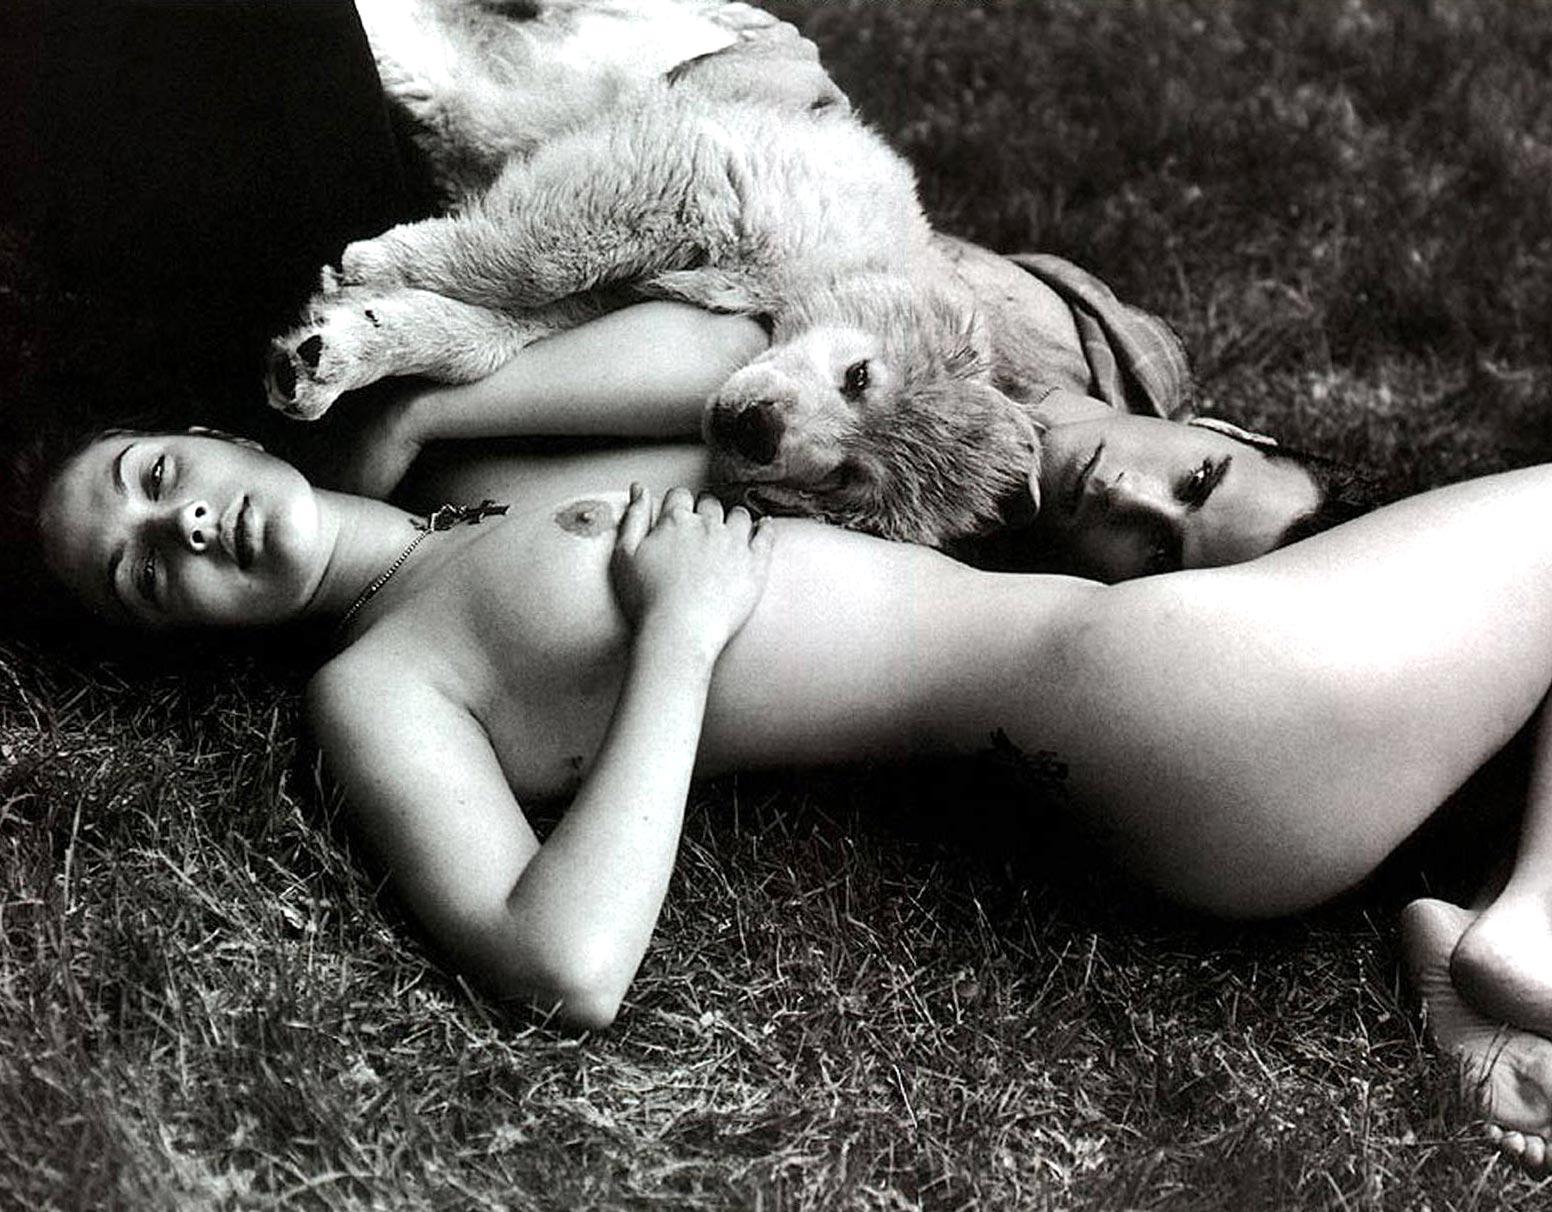 1932-skandalnye-foto-dryu-berrimor--Drew-Barrymore--ot-paparacci